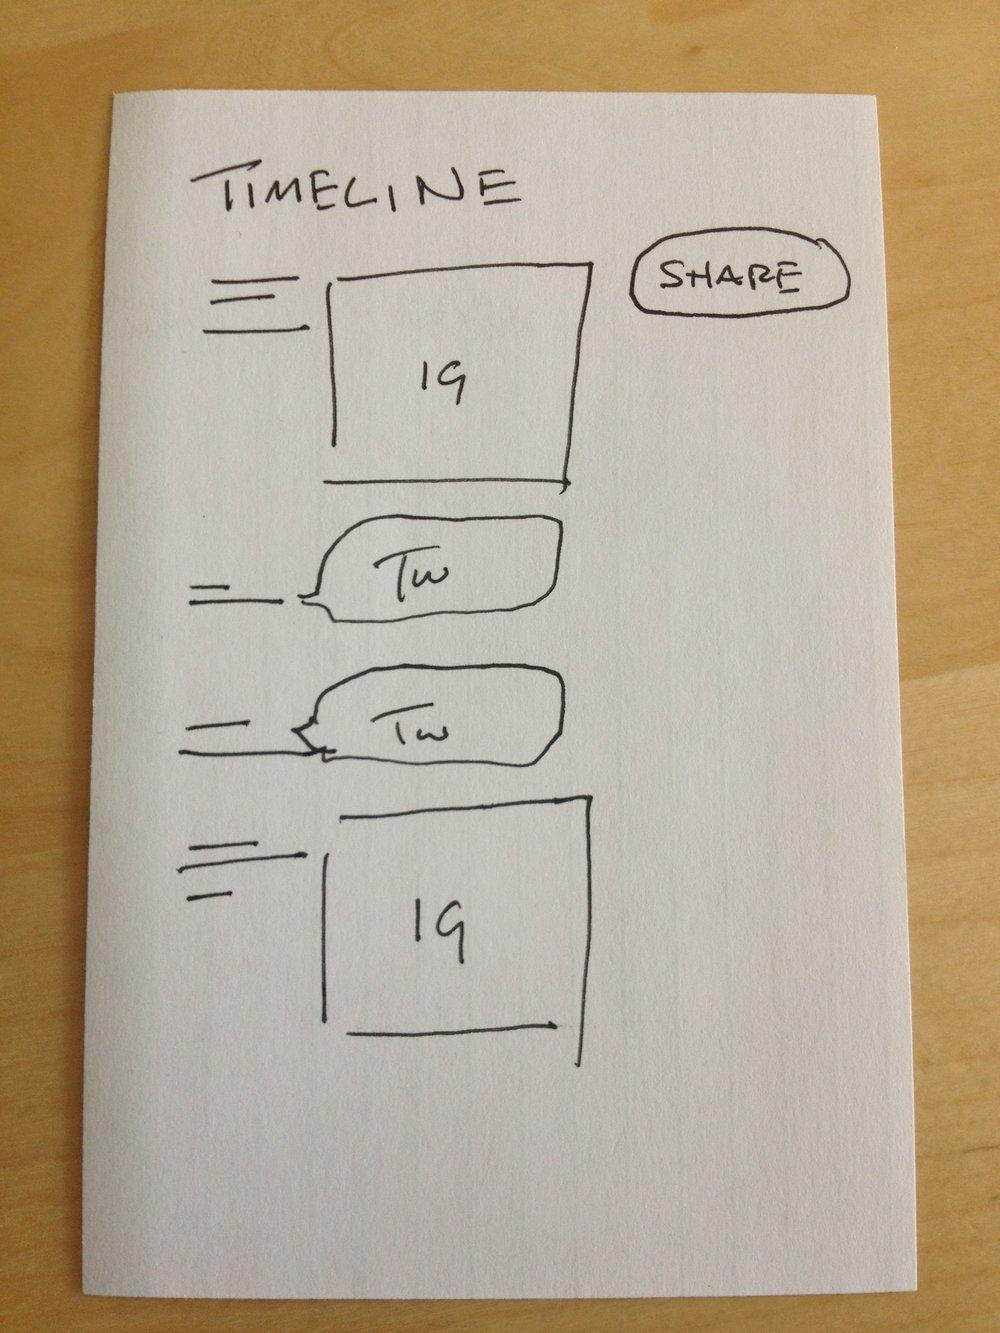 glomentosketch_timeline.JPG